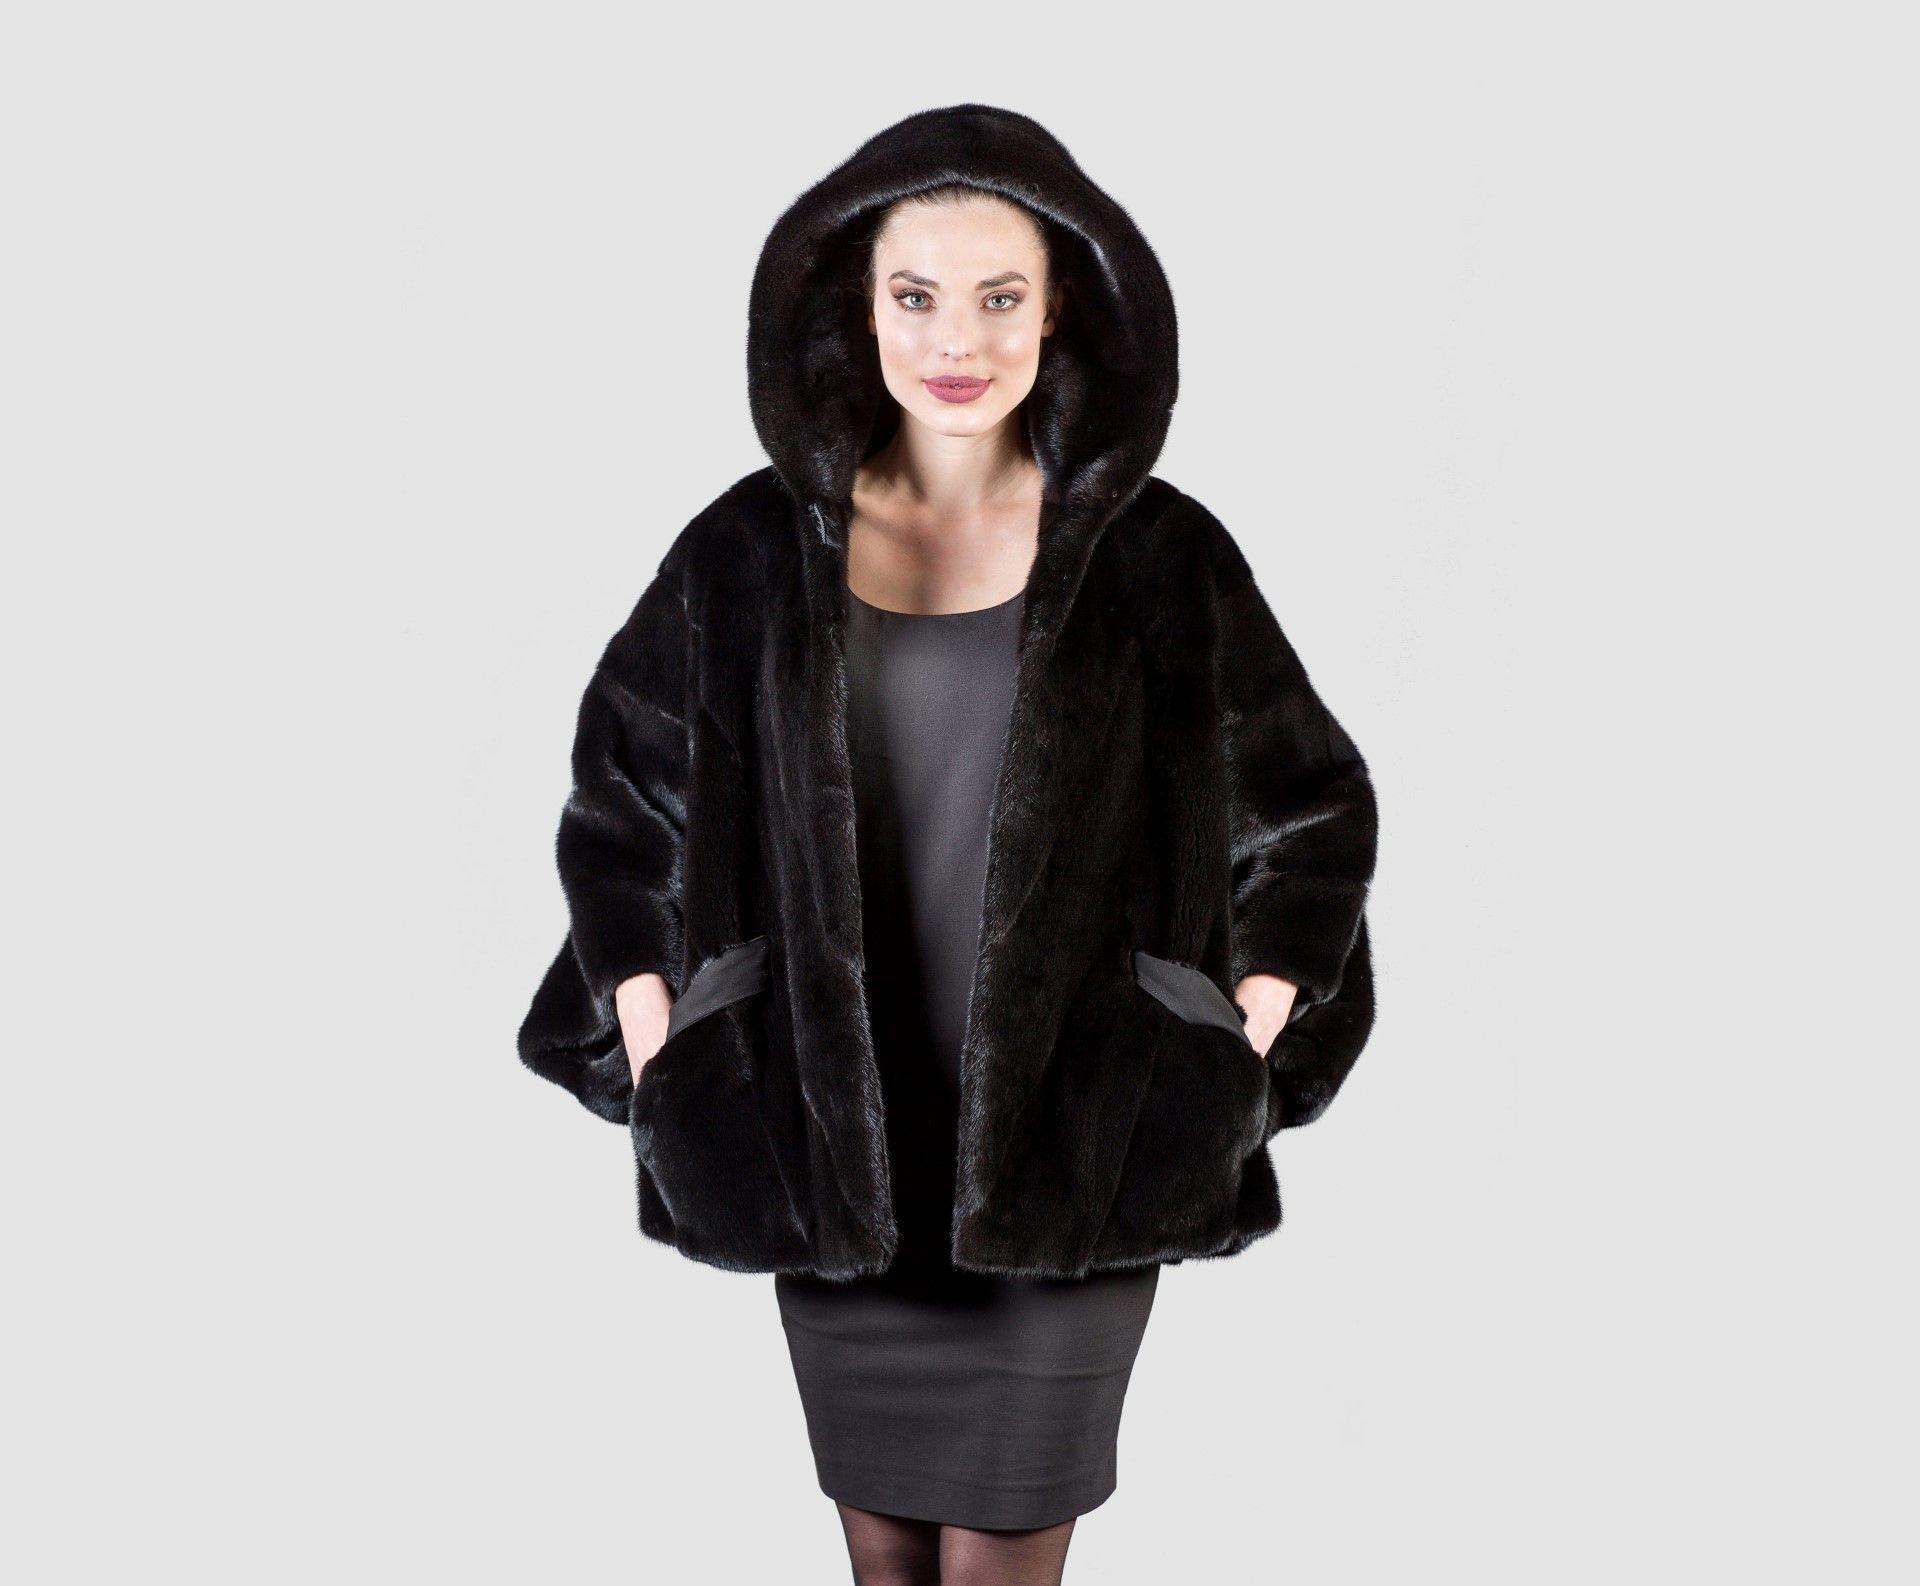 Black Mink Fur Jacket With Hood - 100% Real Fur Coats | Fur ...